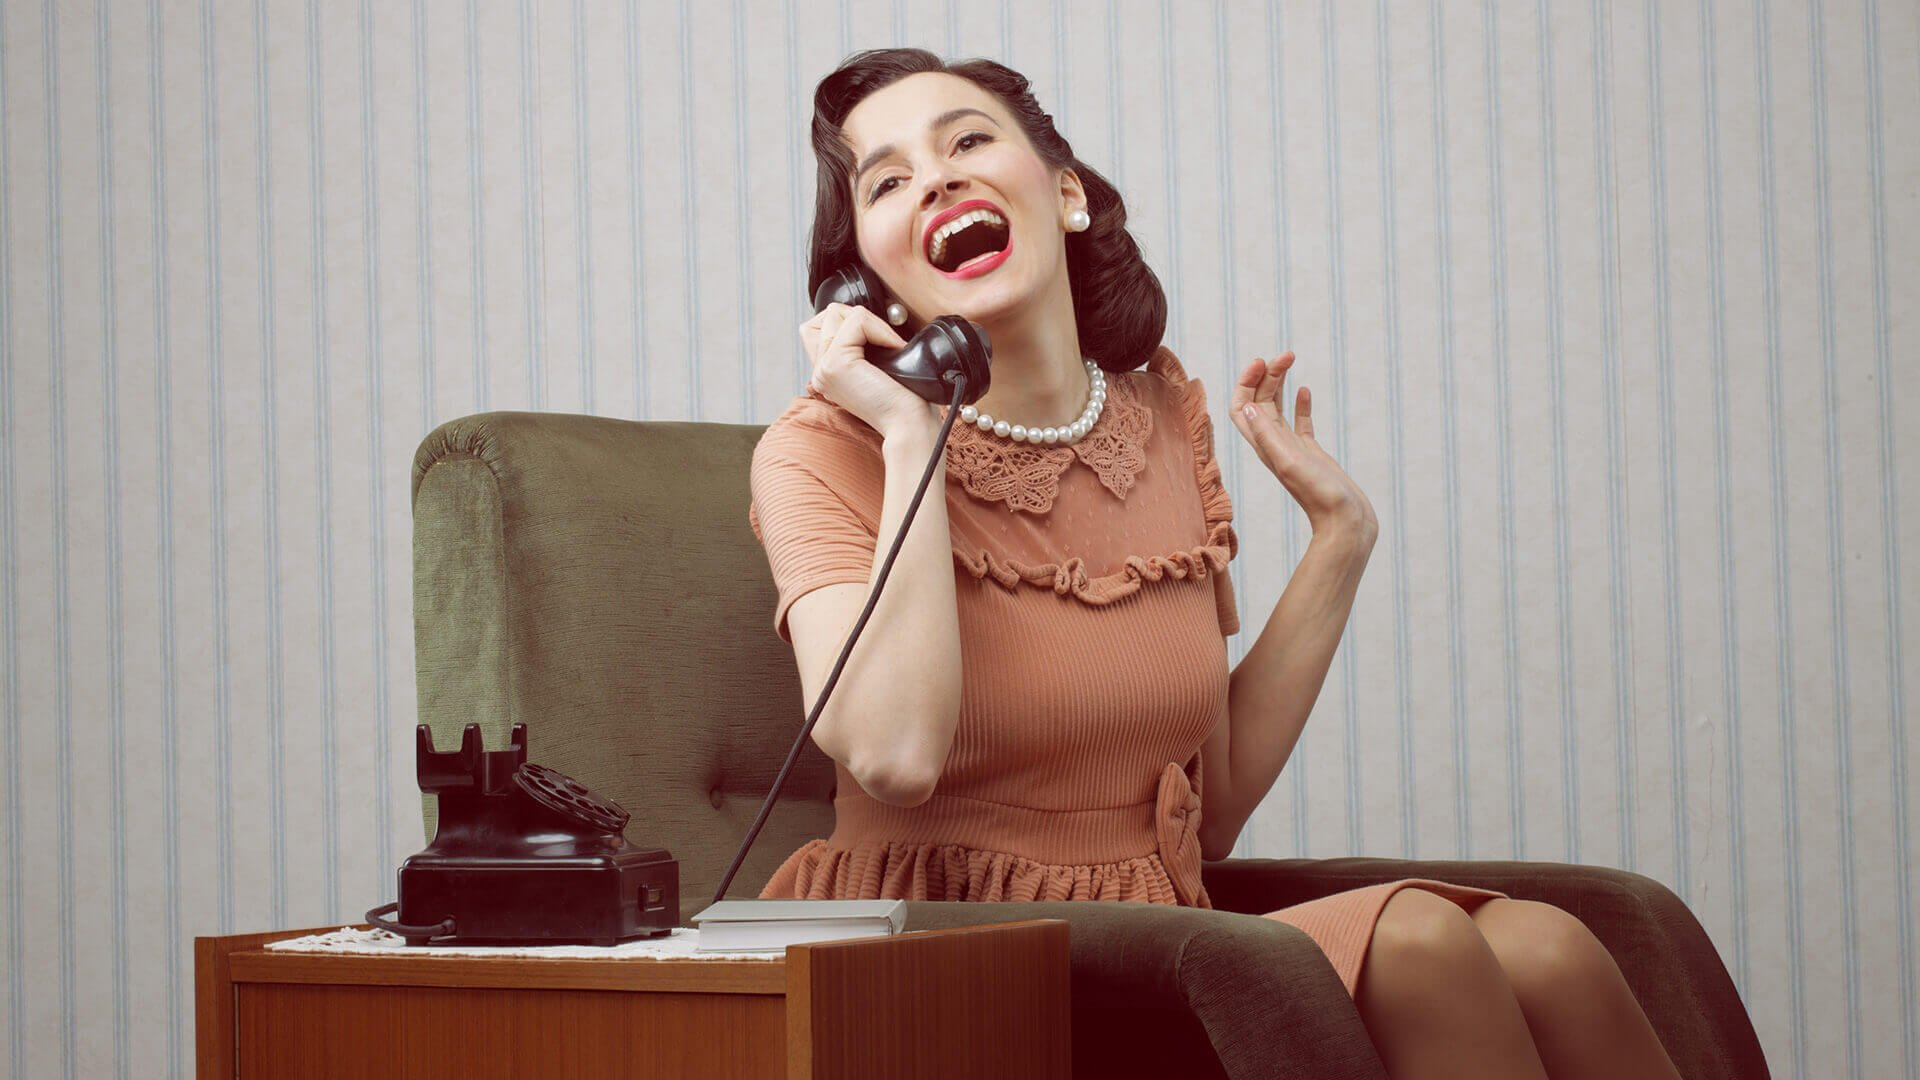 real-moxie-phone-call